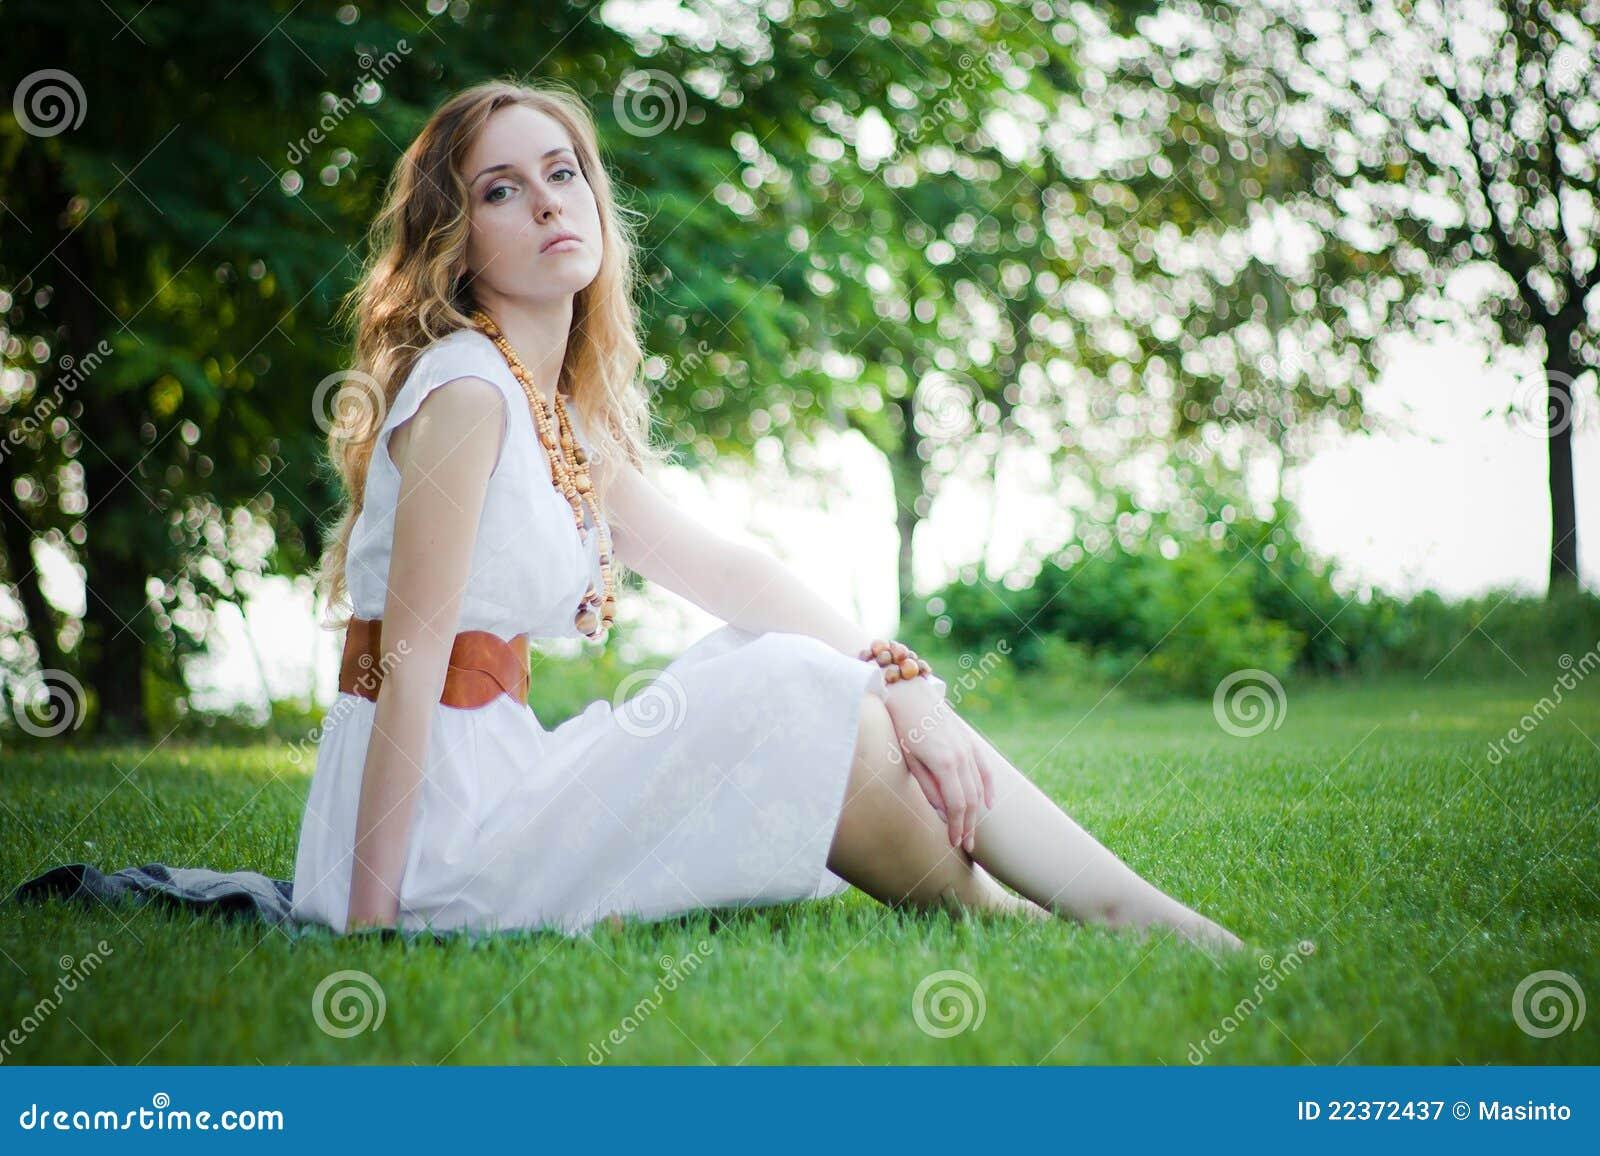 Милая девушка сидит на траве